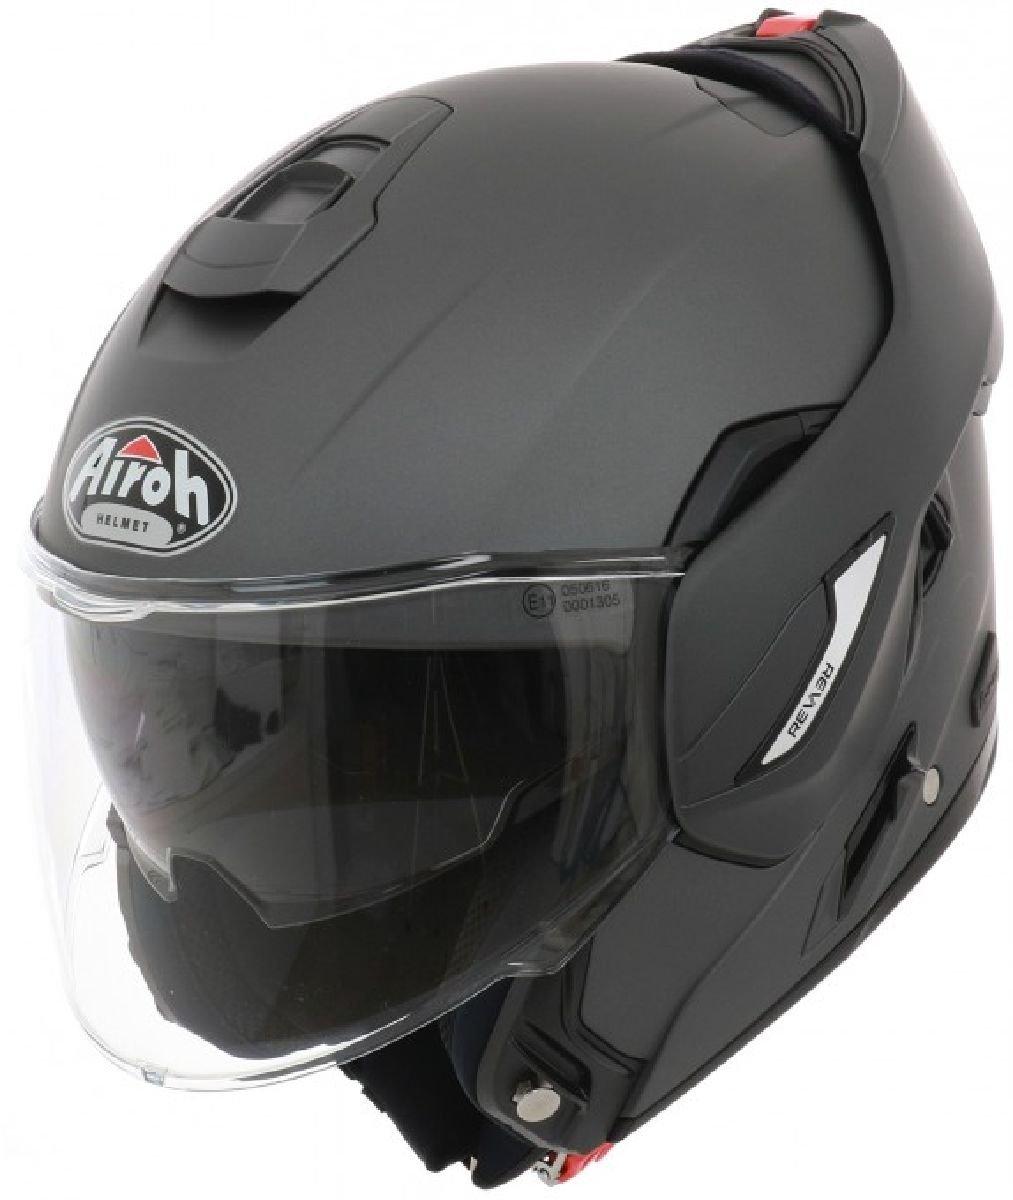 Airoh Helm Rev Color Black Matt S